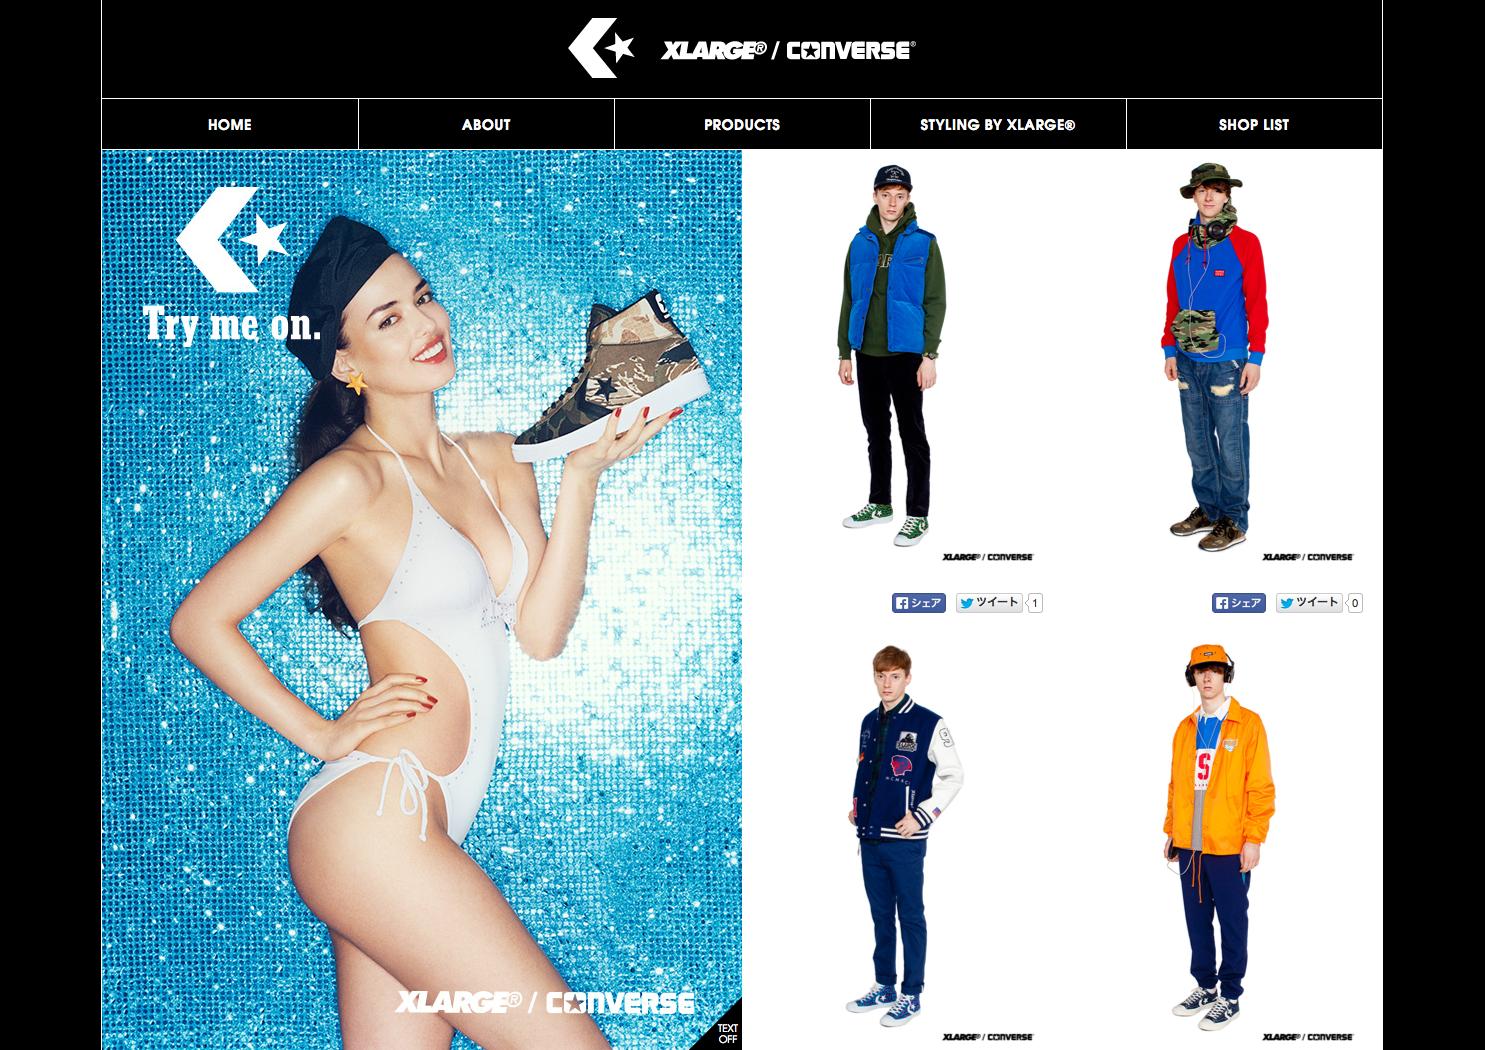 CONVERSE Official Website 2014